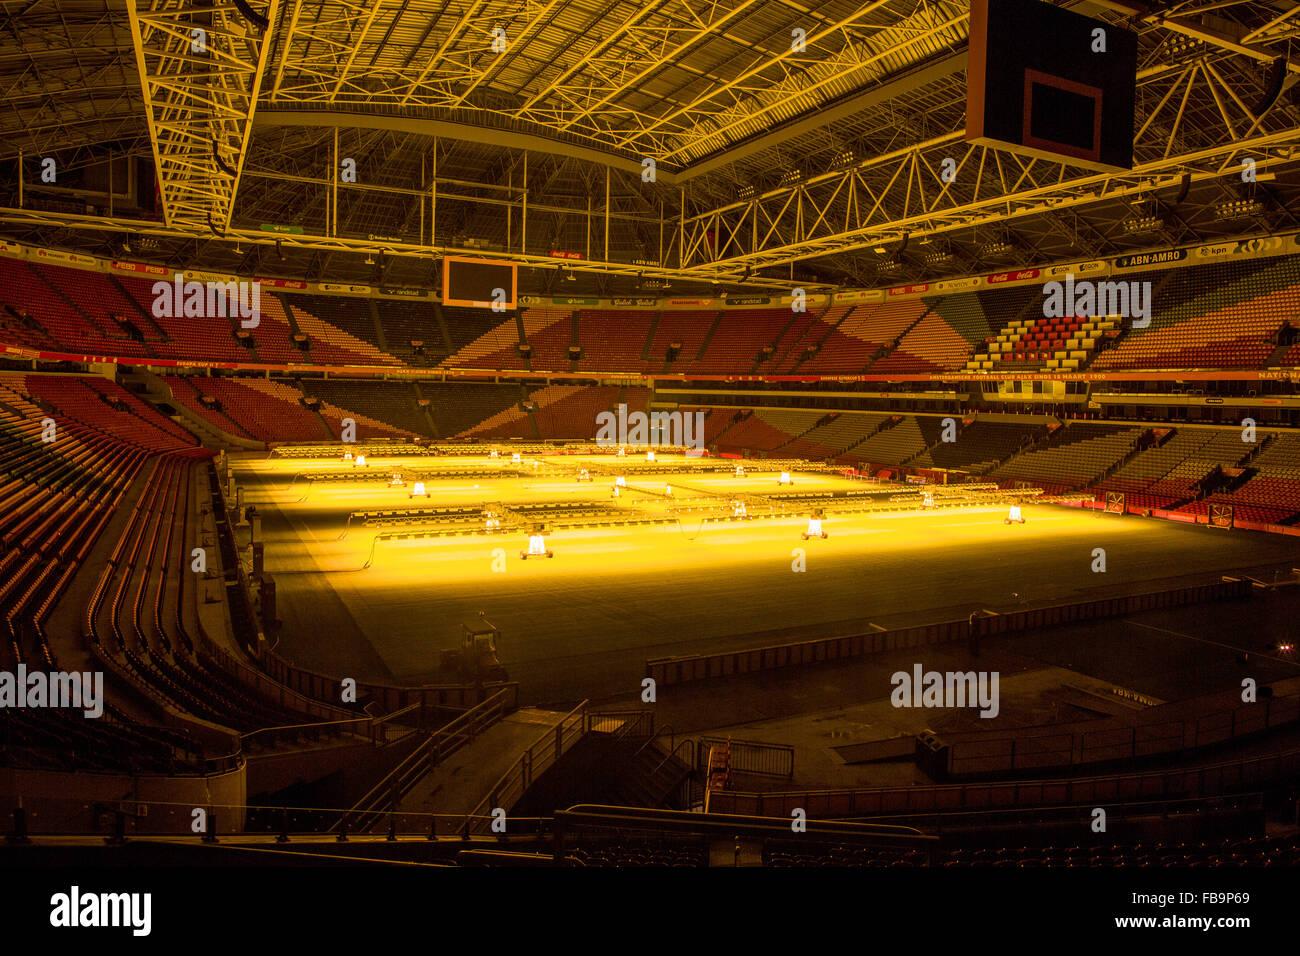 Arena in Amsterdam, home football stadium of dutch team Ajax - Stock Image